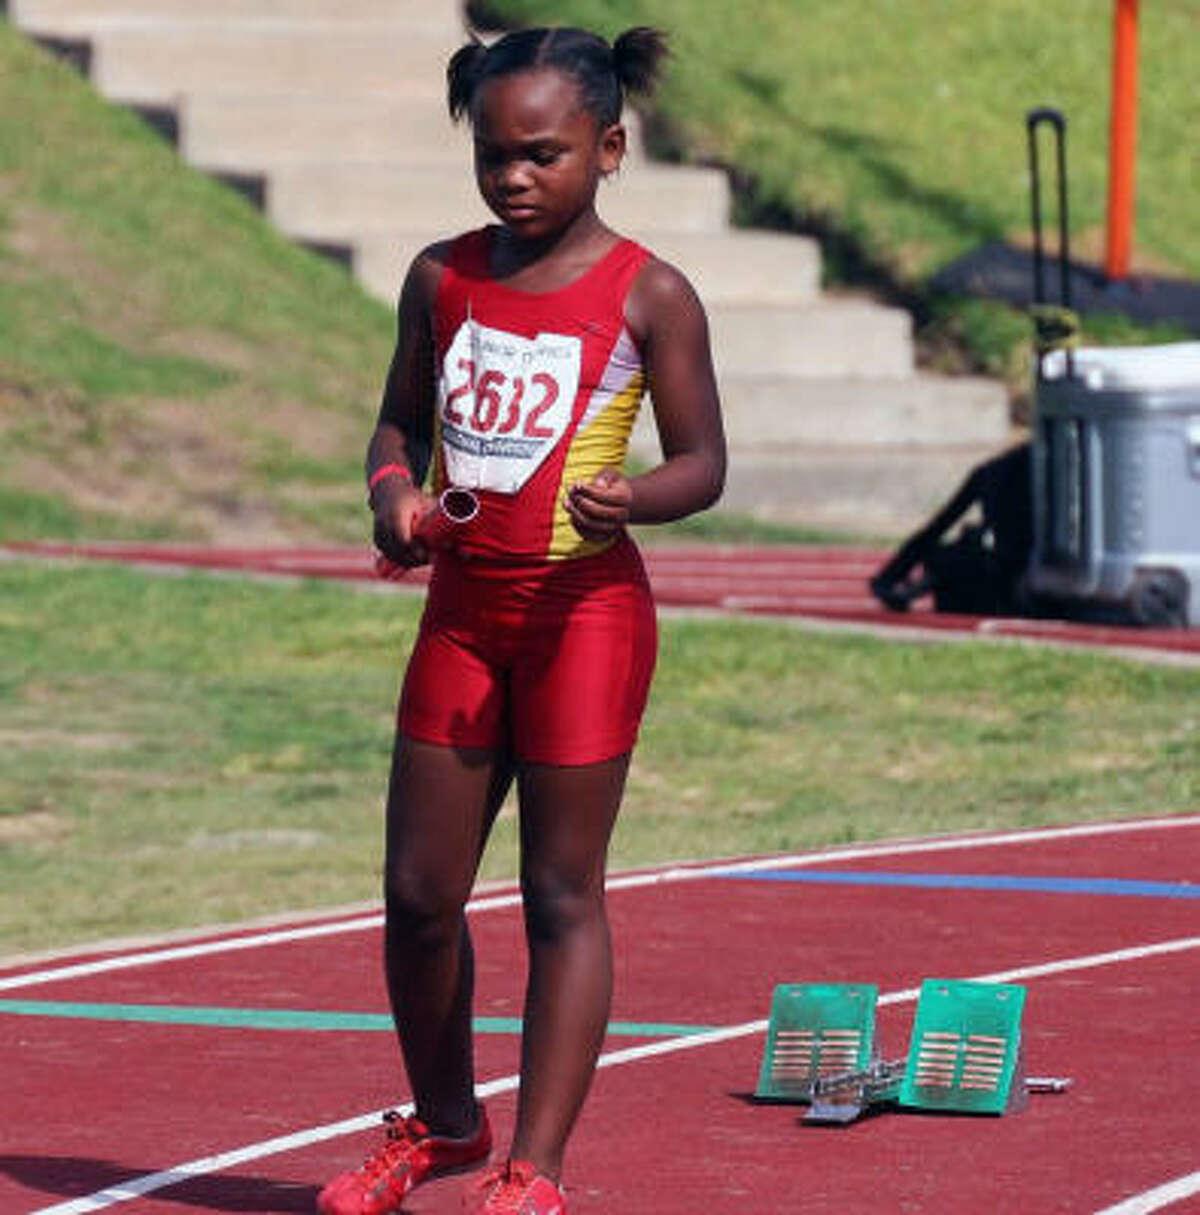 Kenya Furlow of the Houston Heat gets set to run the 400-meter relay.